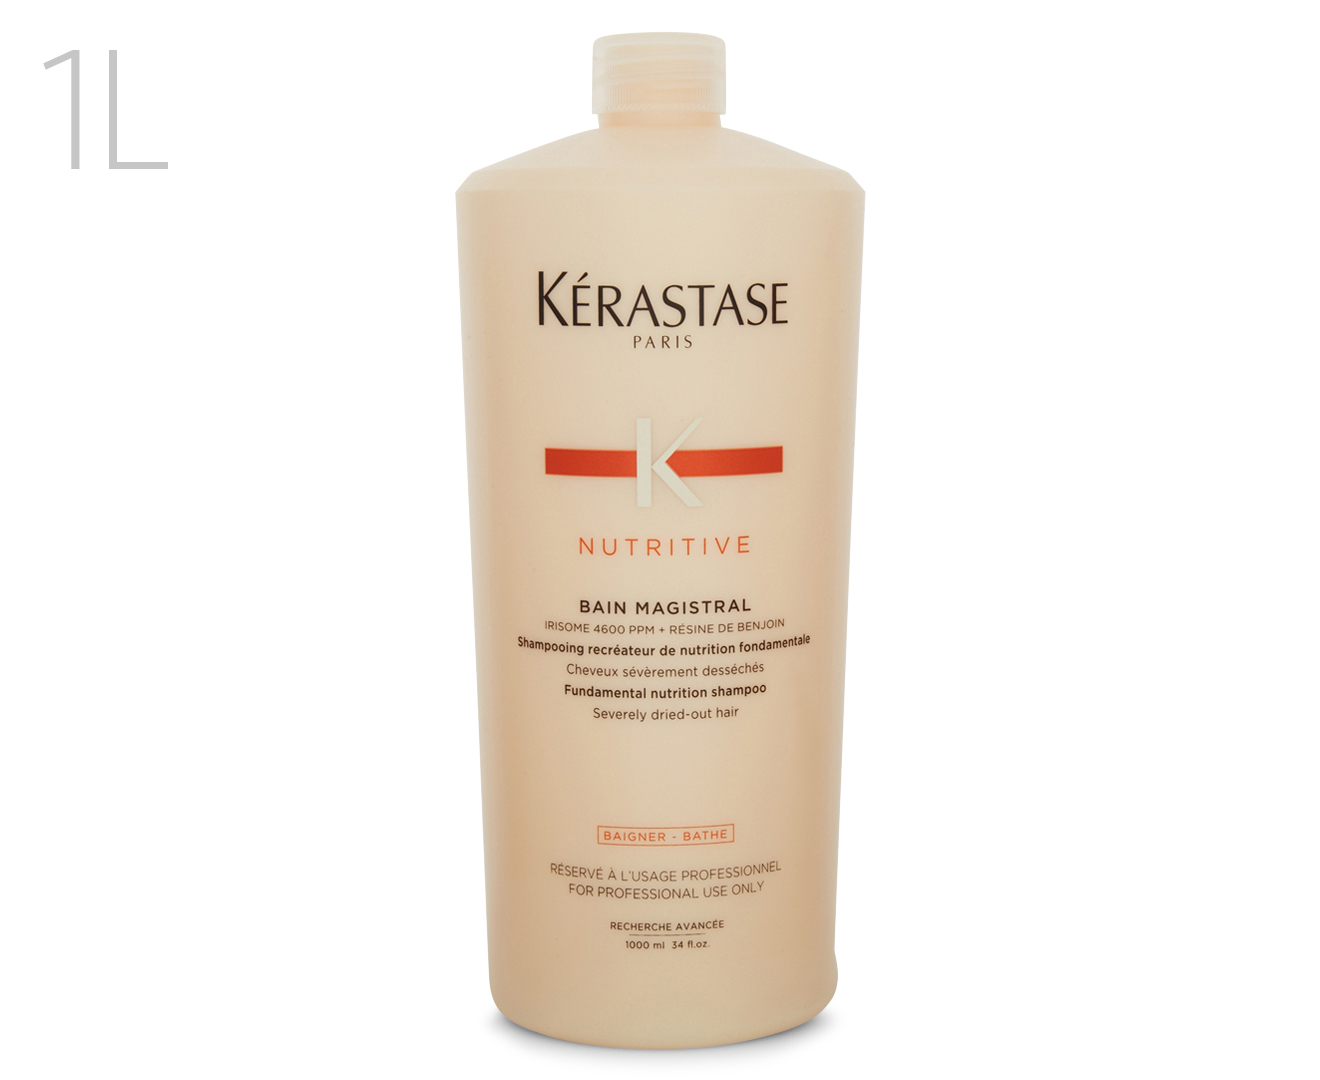 K rastase bain magistral shampoo 1l for Kerastase bain miroir shine revealing shampoo